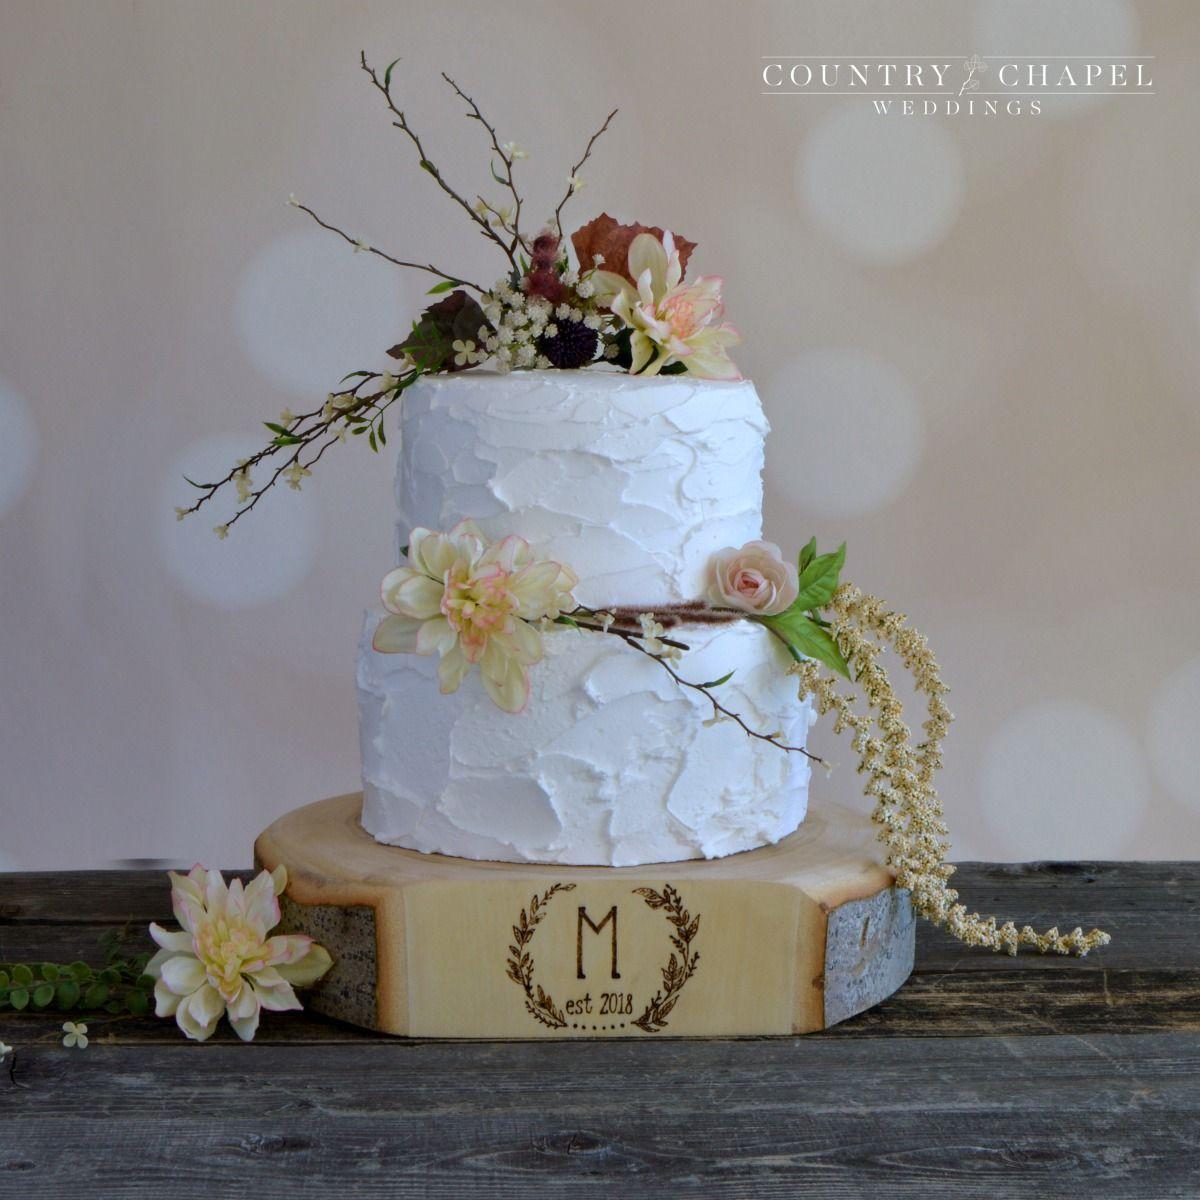 Monogrammed wreath cake stand rustic wedding pinterest wedding